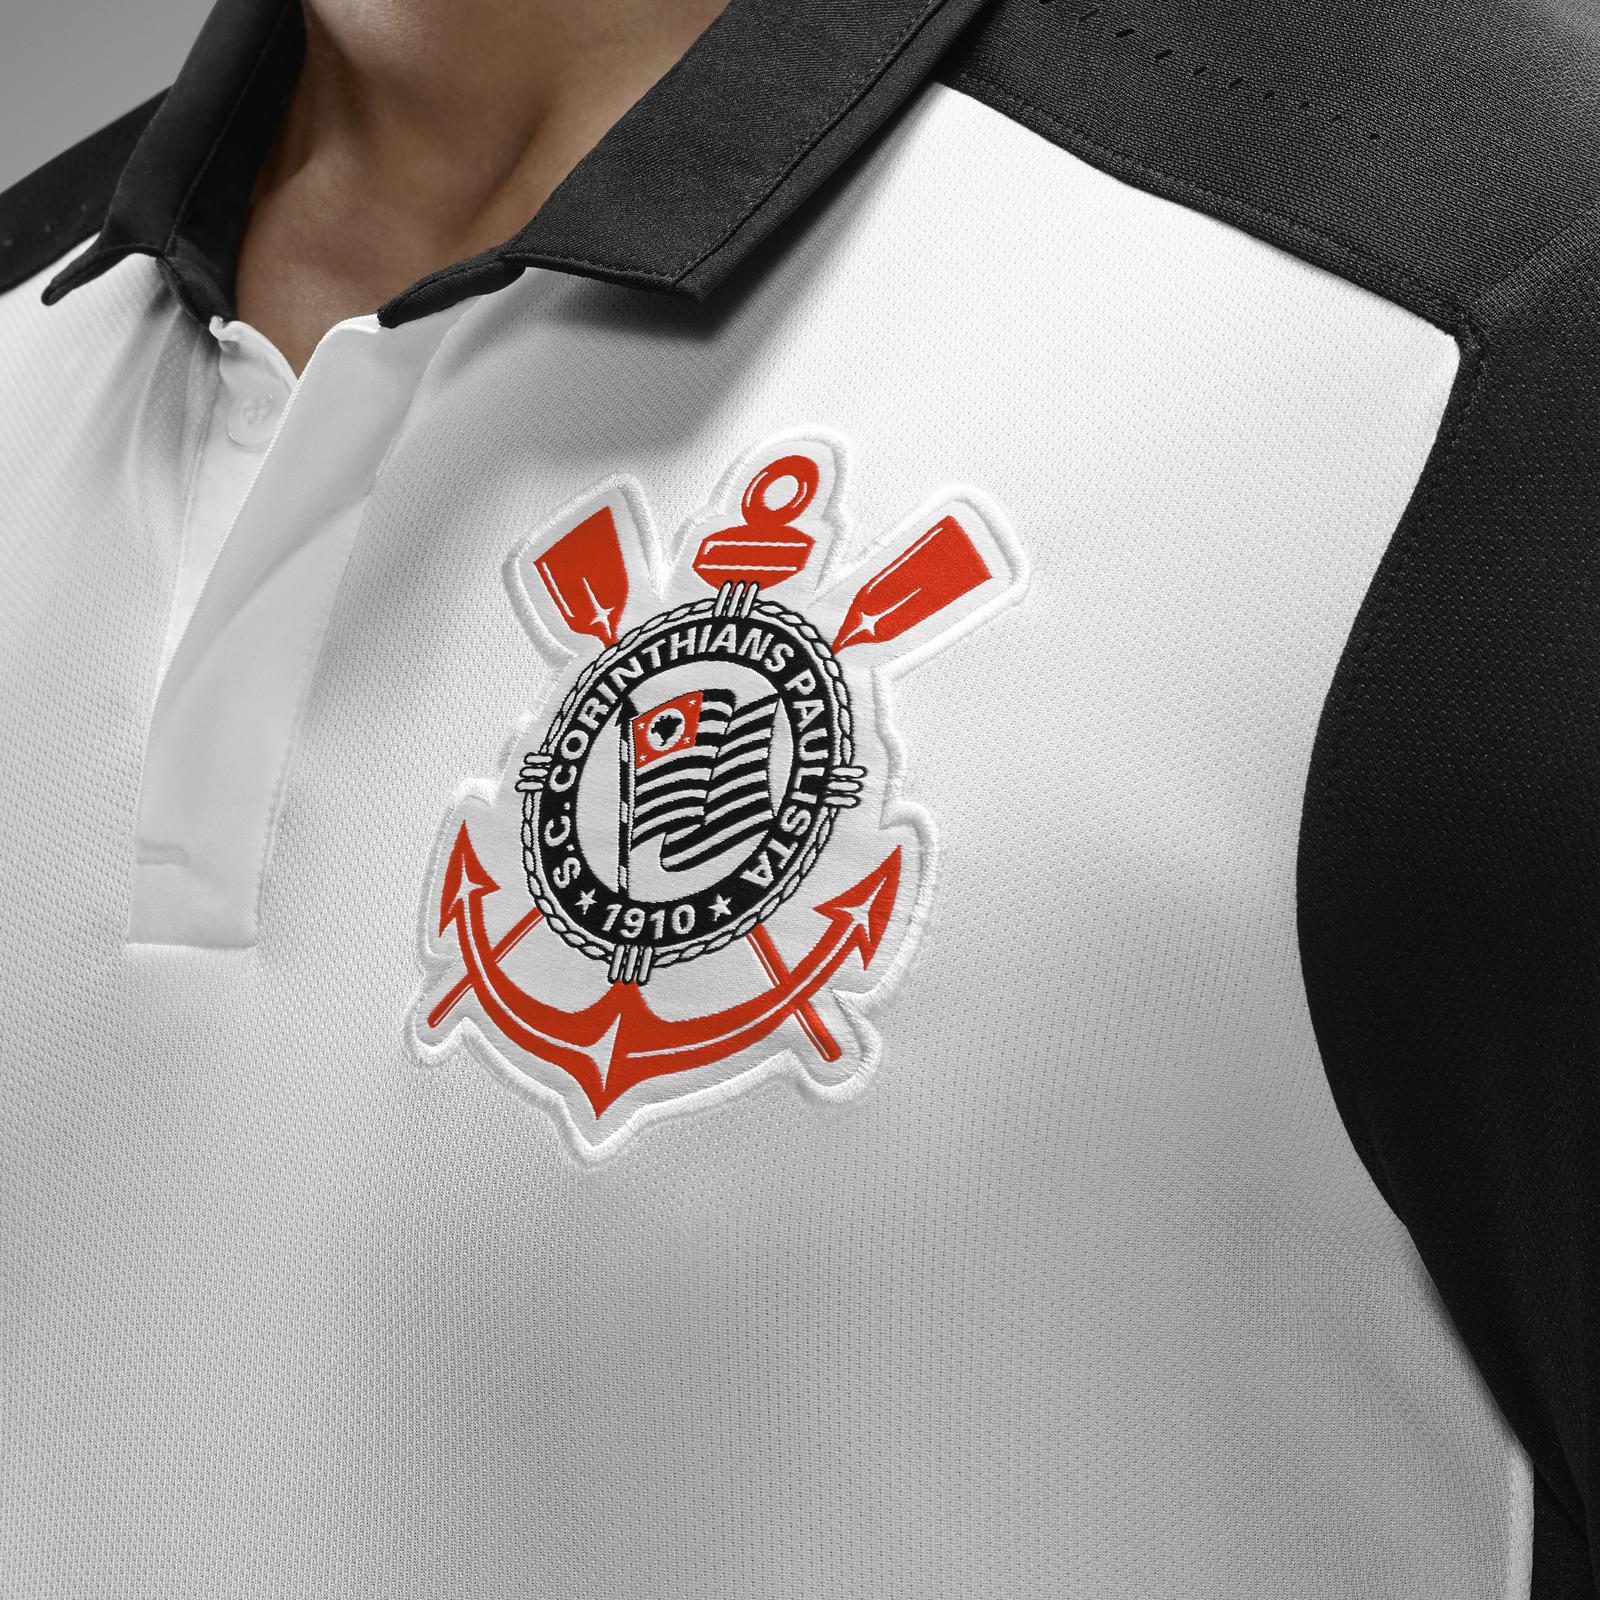 182a1f113 FY15 FB Brasil Corintihians Home Crest 0879.  FY15 FB Brasil Corintihians Home Hero 0834.  FY15 FB Brasil Corintihians Home Collar 1954